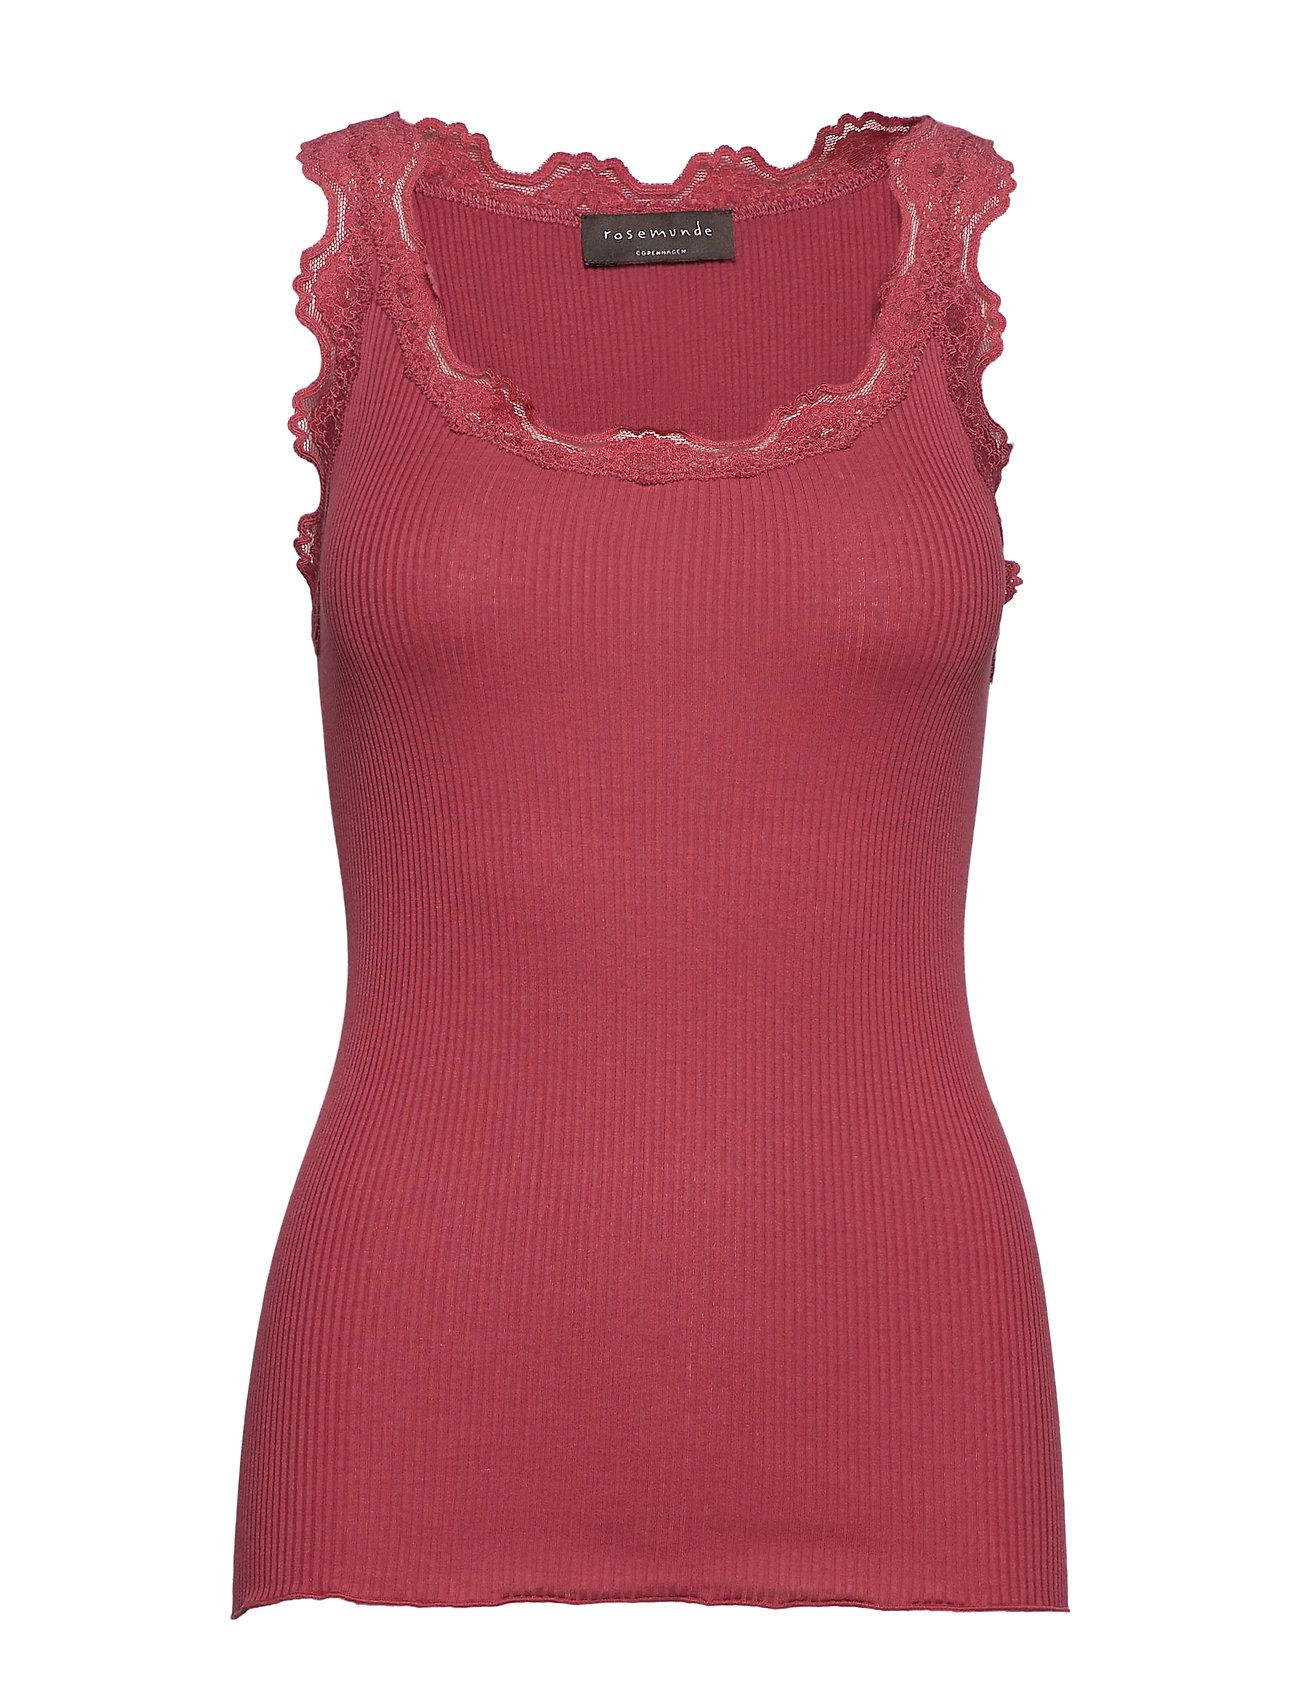 Rosemunde Silk top - SCARLET RED